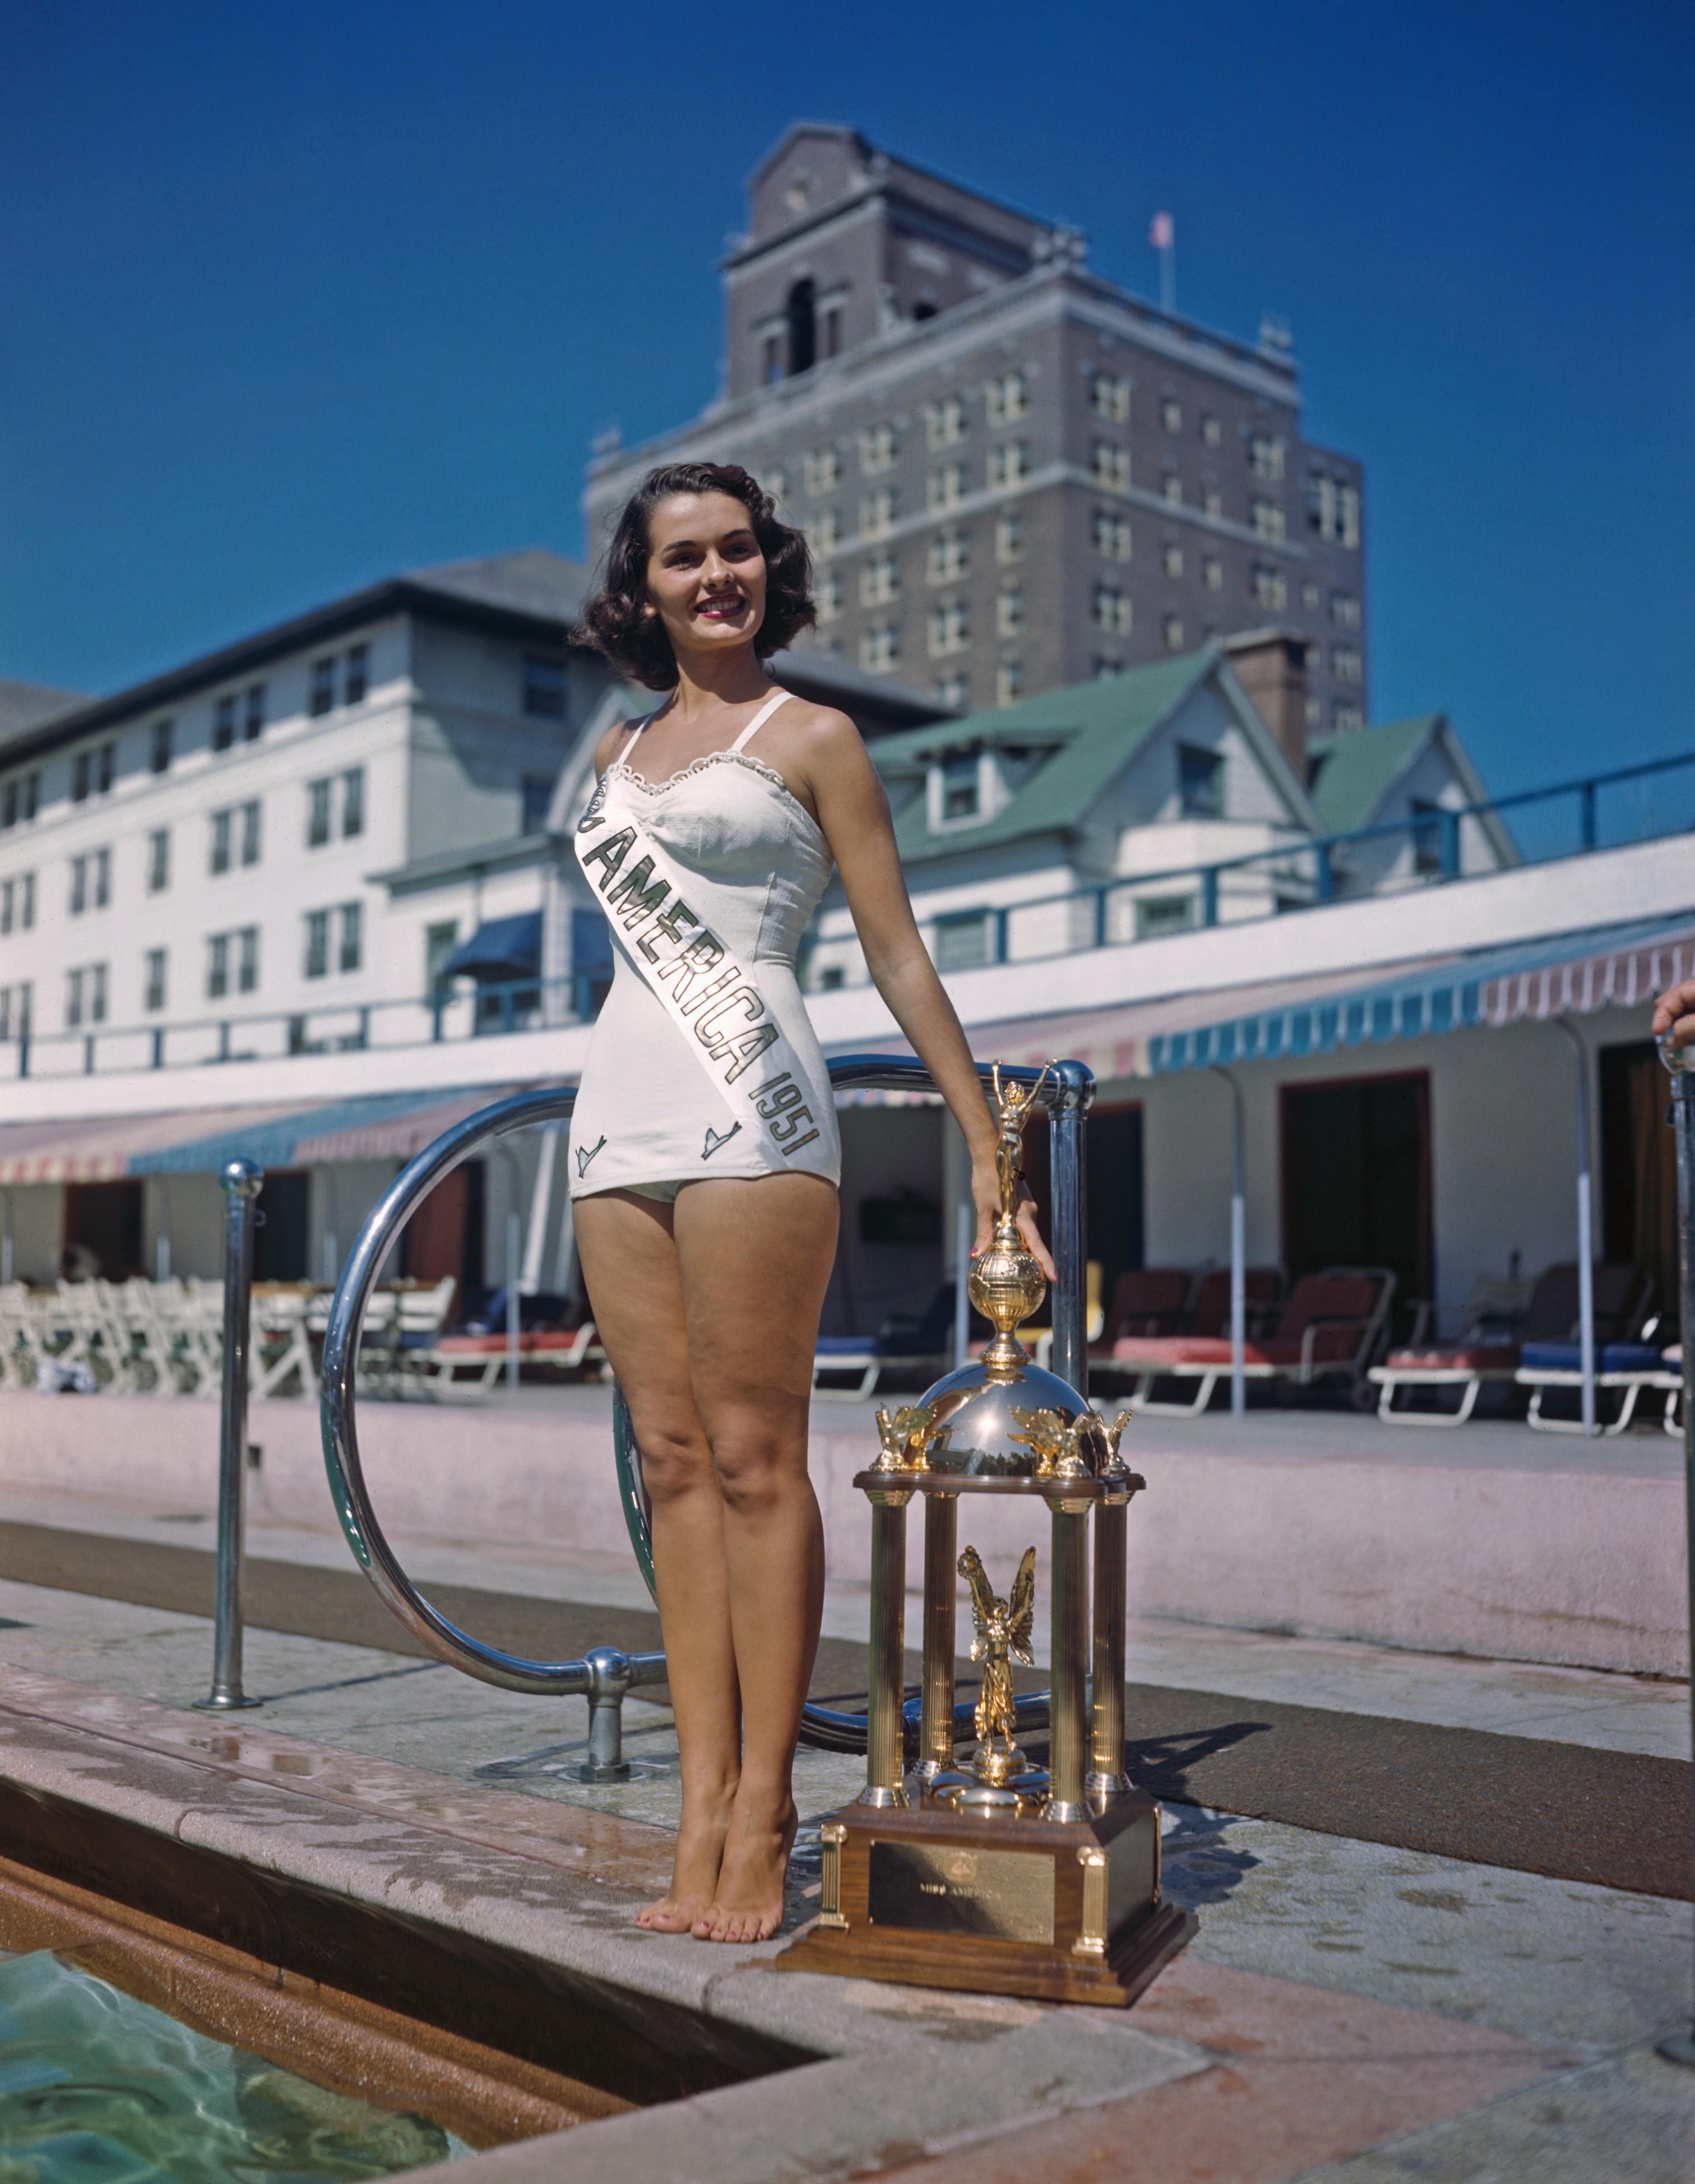 1951: Yolande Betbeze from Mobile, Ala.